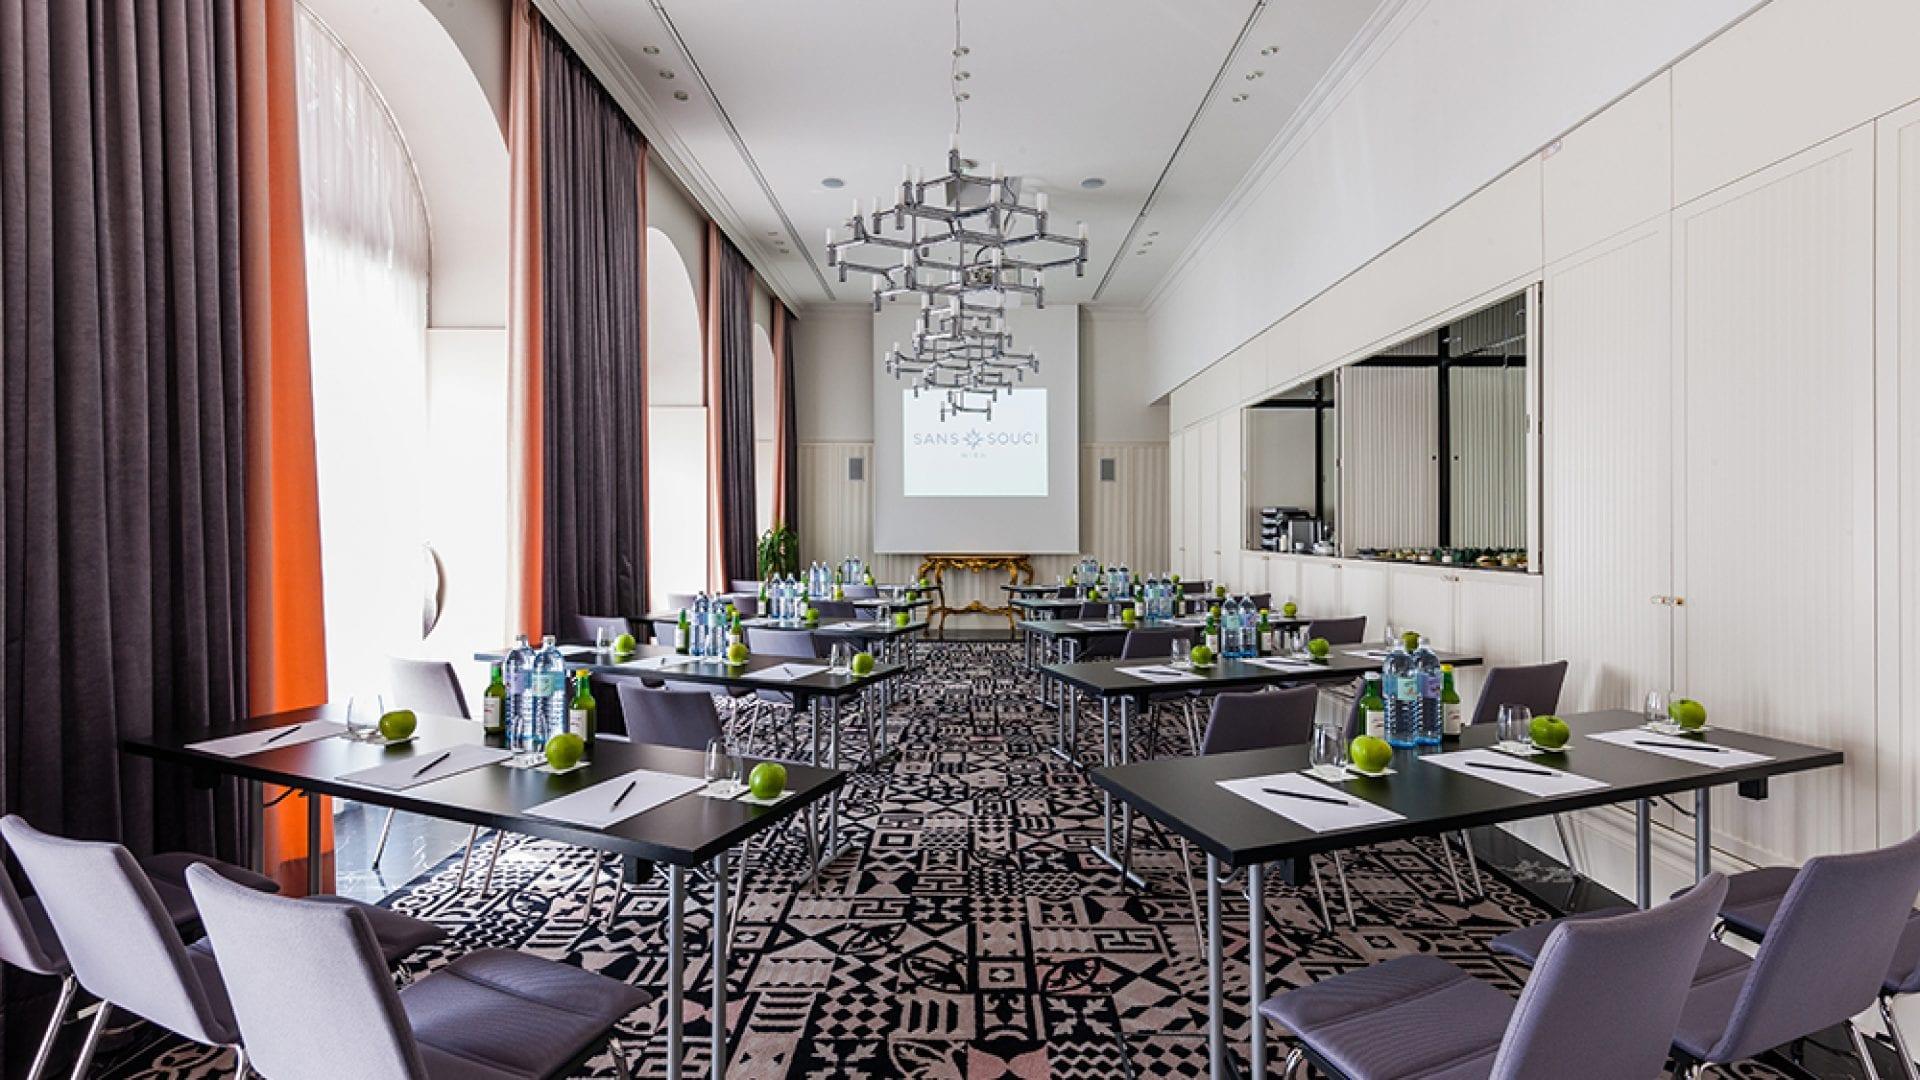 Veranstaltungsraum Le Salon in Wien | Kunsthotel Sans Souci